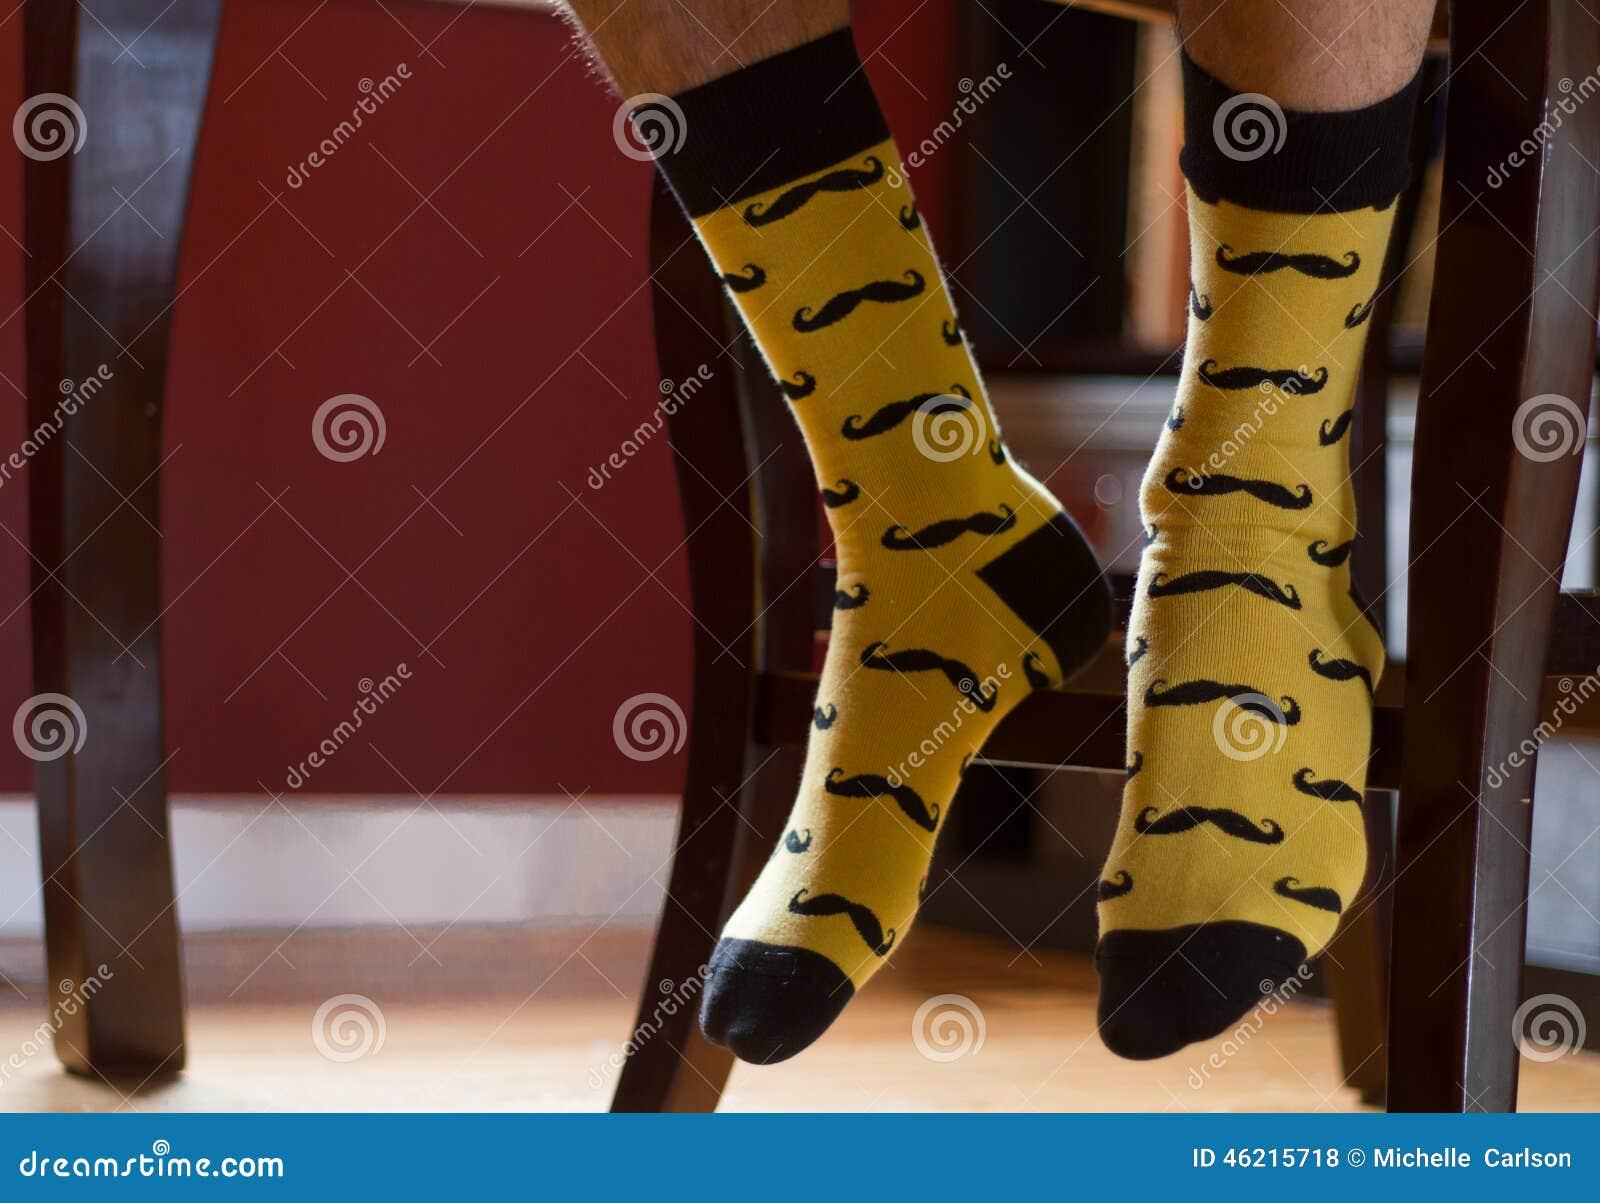 Mannens fot med infallsockor skrivev ut med mustascher